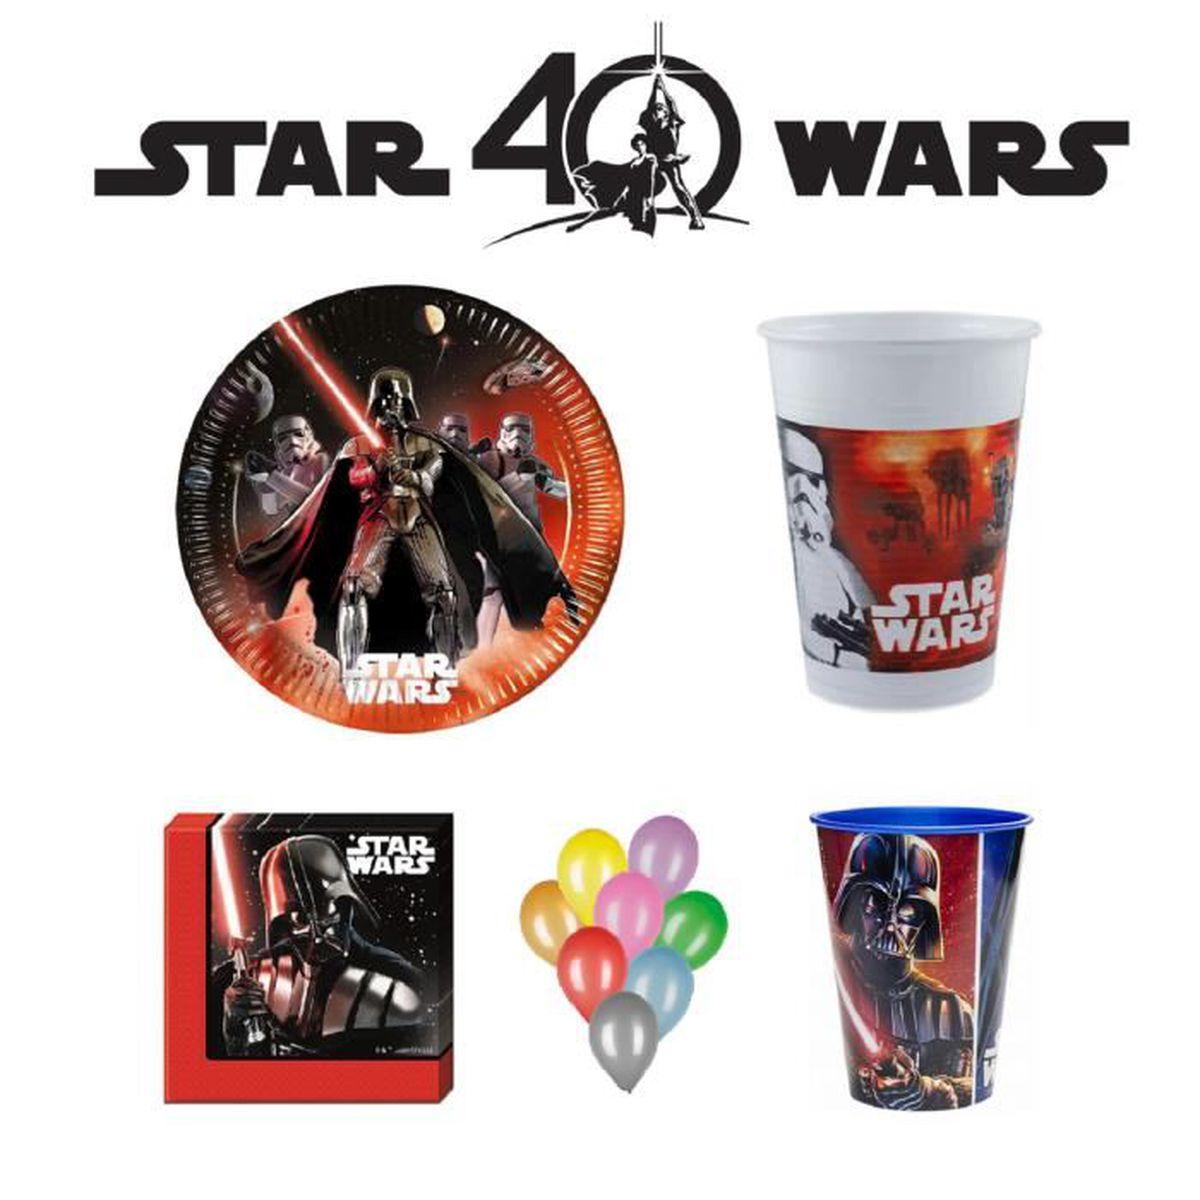 Kit Decoration Anniversaire Star Wars 8 Achat Vente Set Vaisselle Jetable Cdiscount